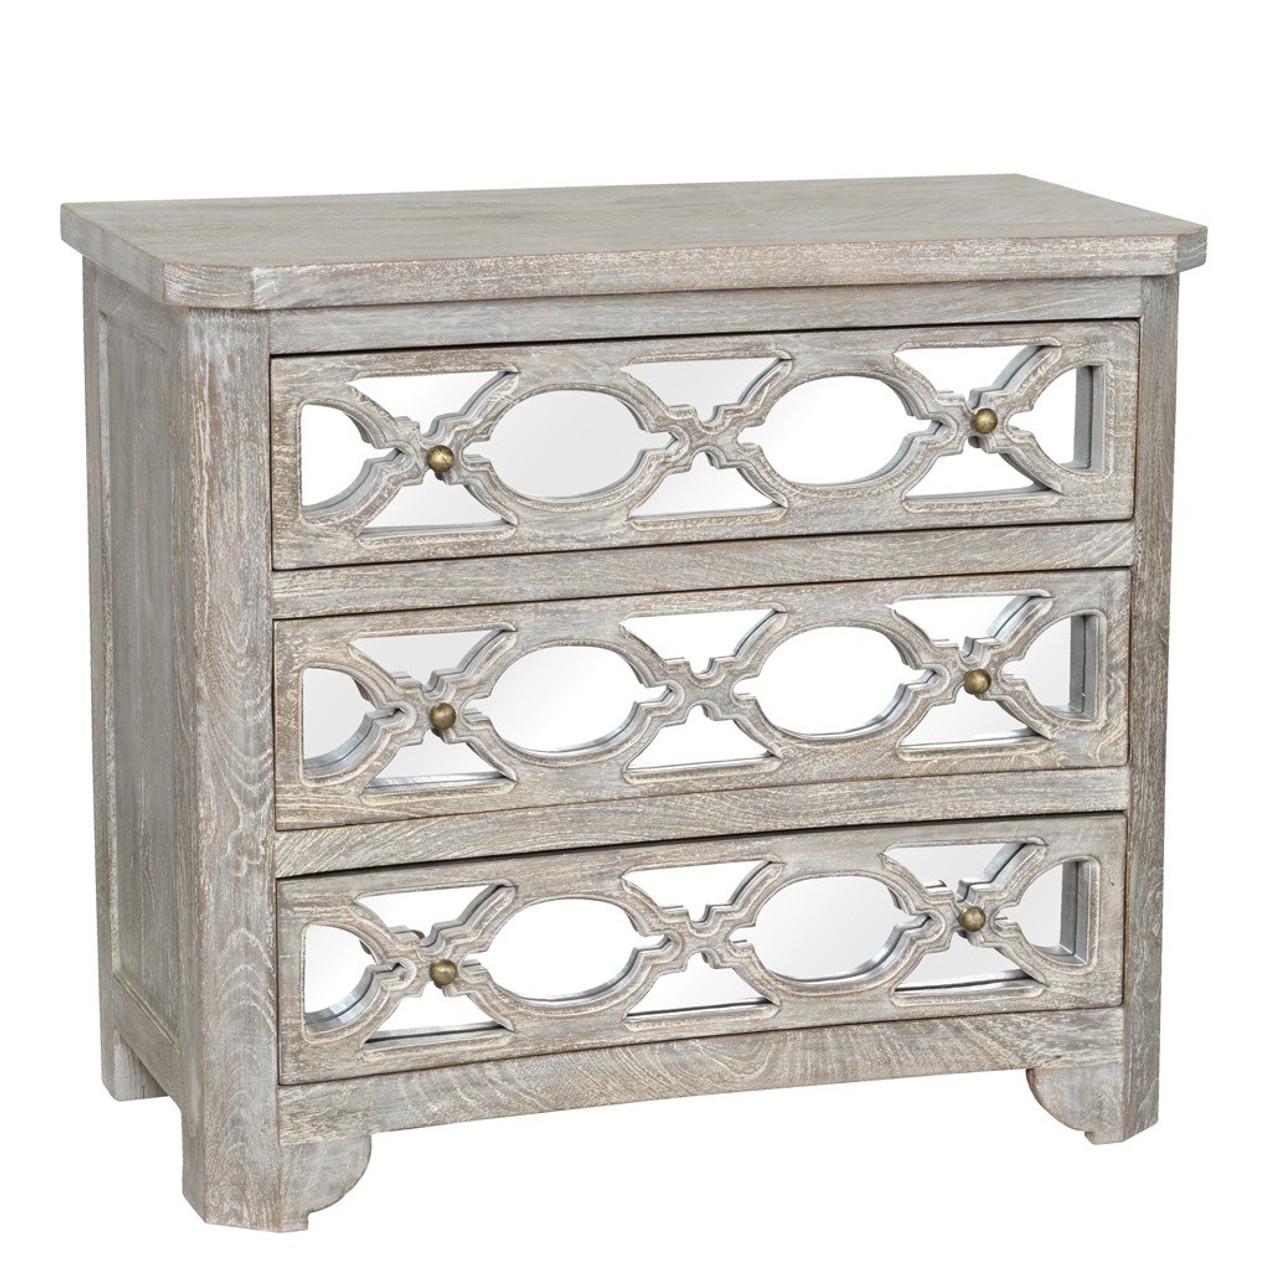 whitewash wood furniture. Lattice Whitewash Wood Mirrored 3 Drawers Chest Furniture